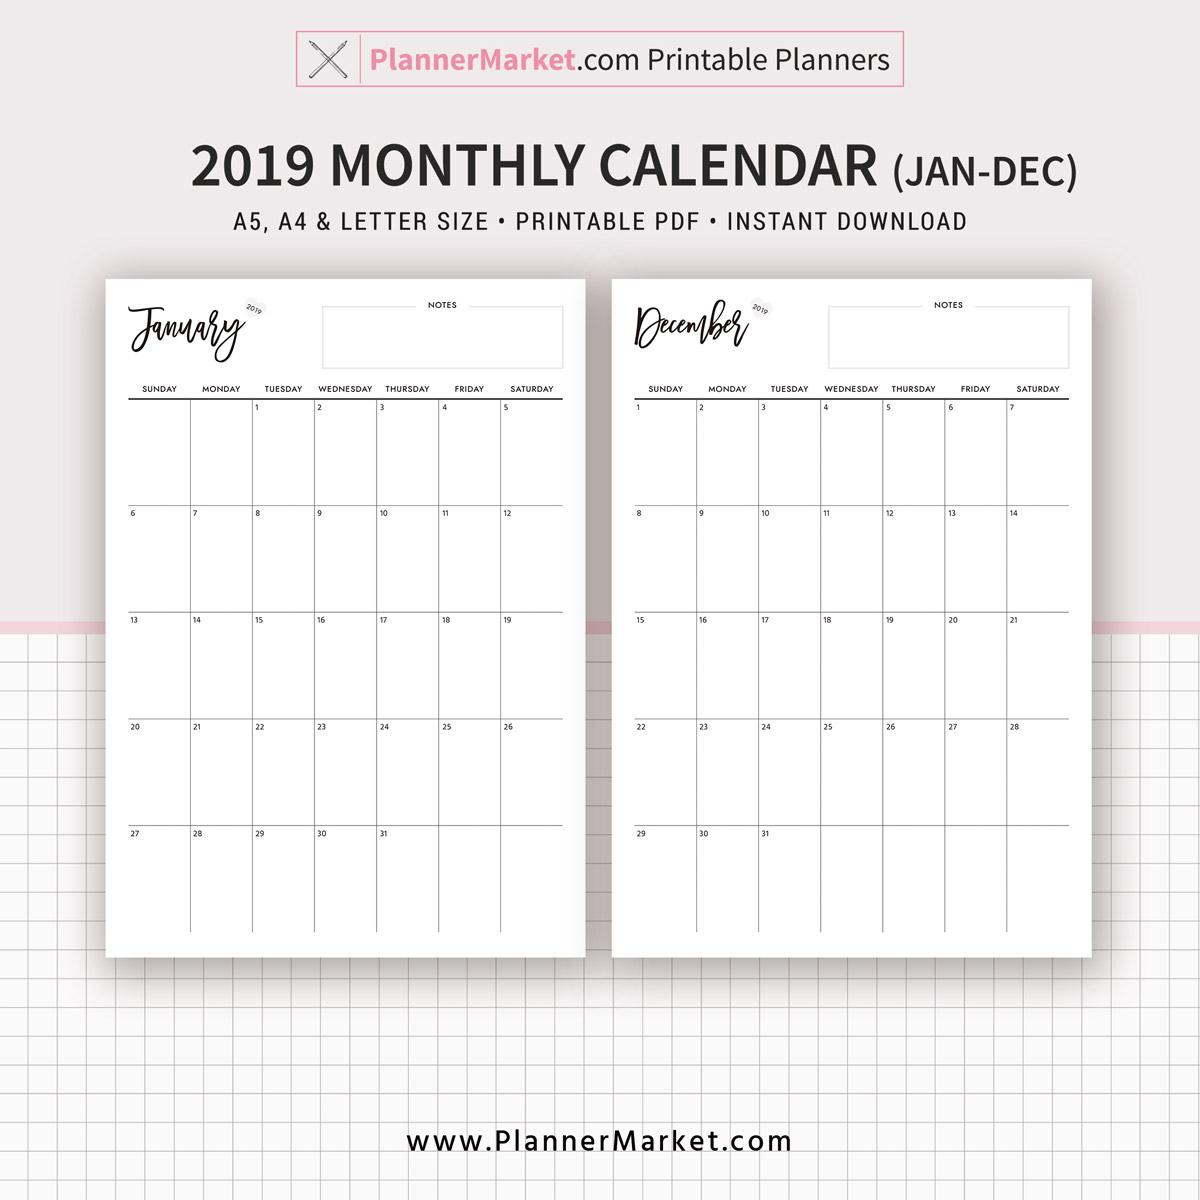 Monthly Calendar, Monthly Planner, 2019 Calendar, A5, A4, Letter Size,  Refills, Planner Binder, Instant Download